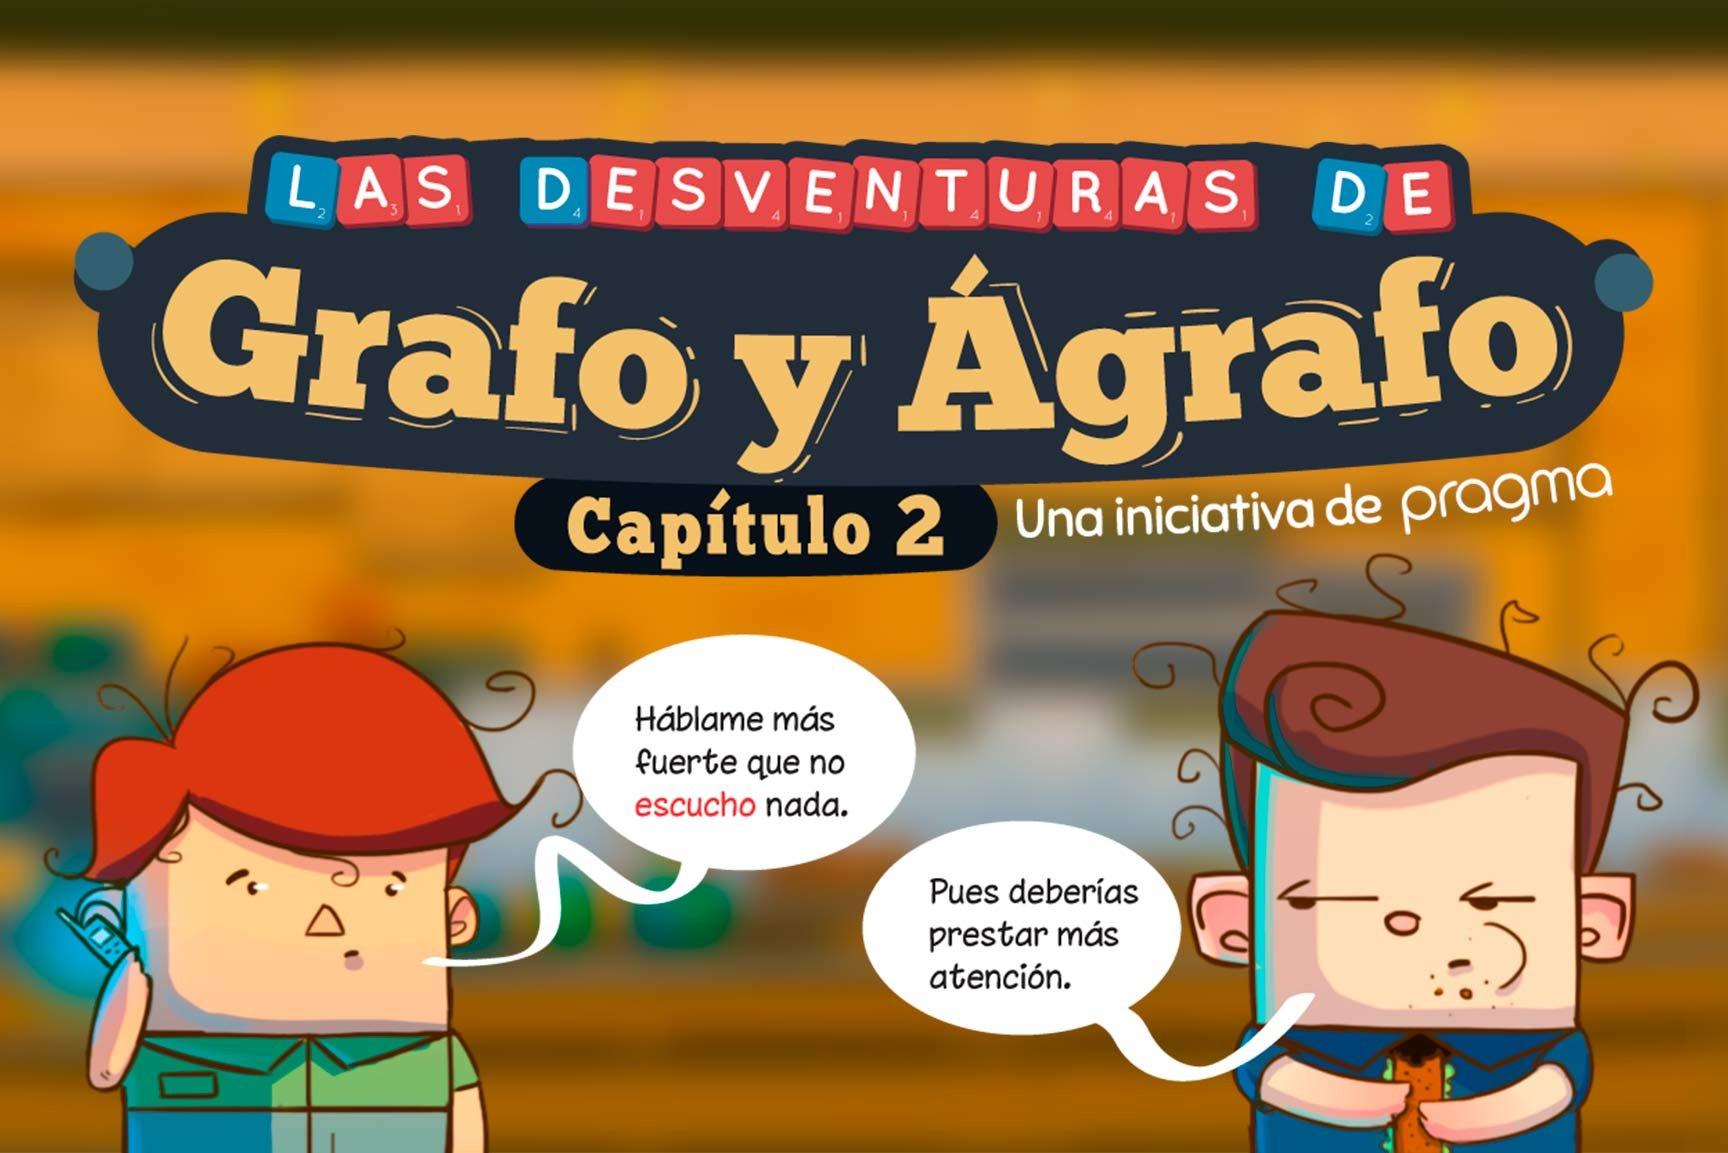 h_grafo_y_aragrafo_imprecisiones_lexicas